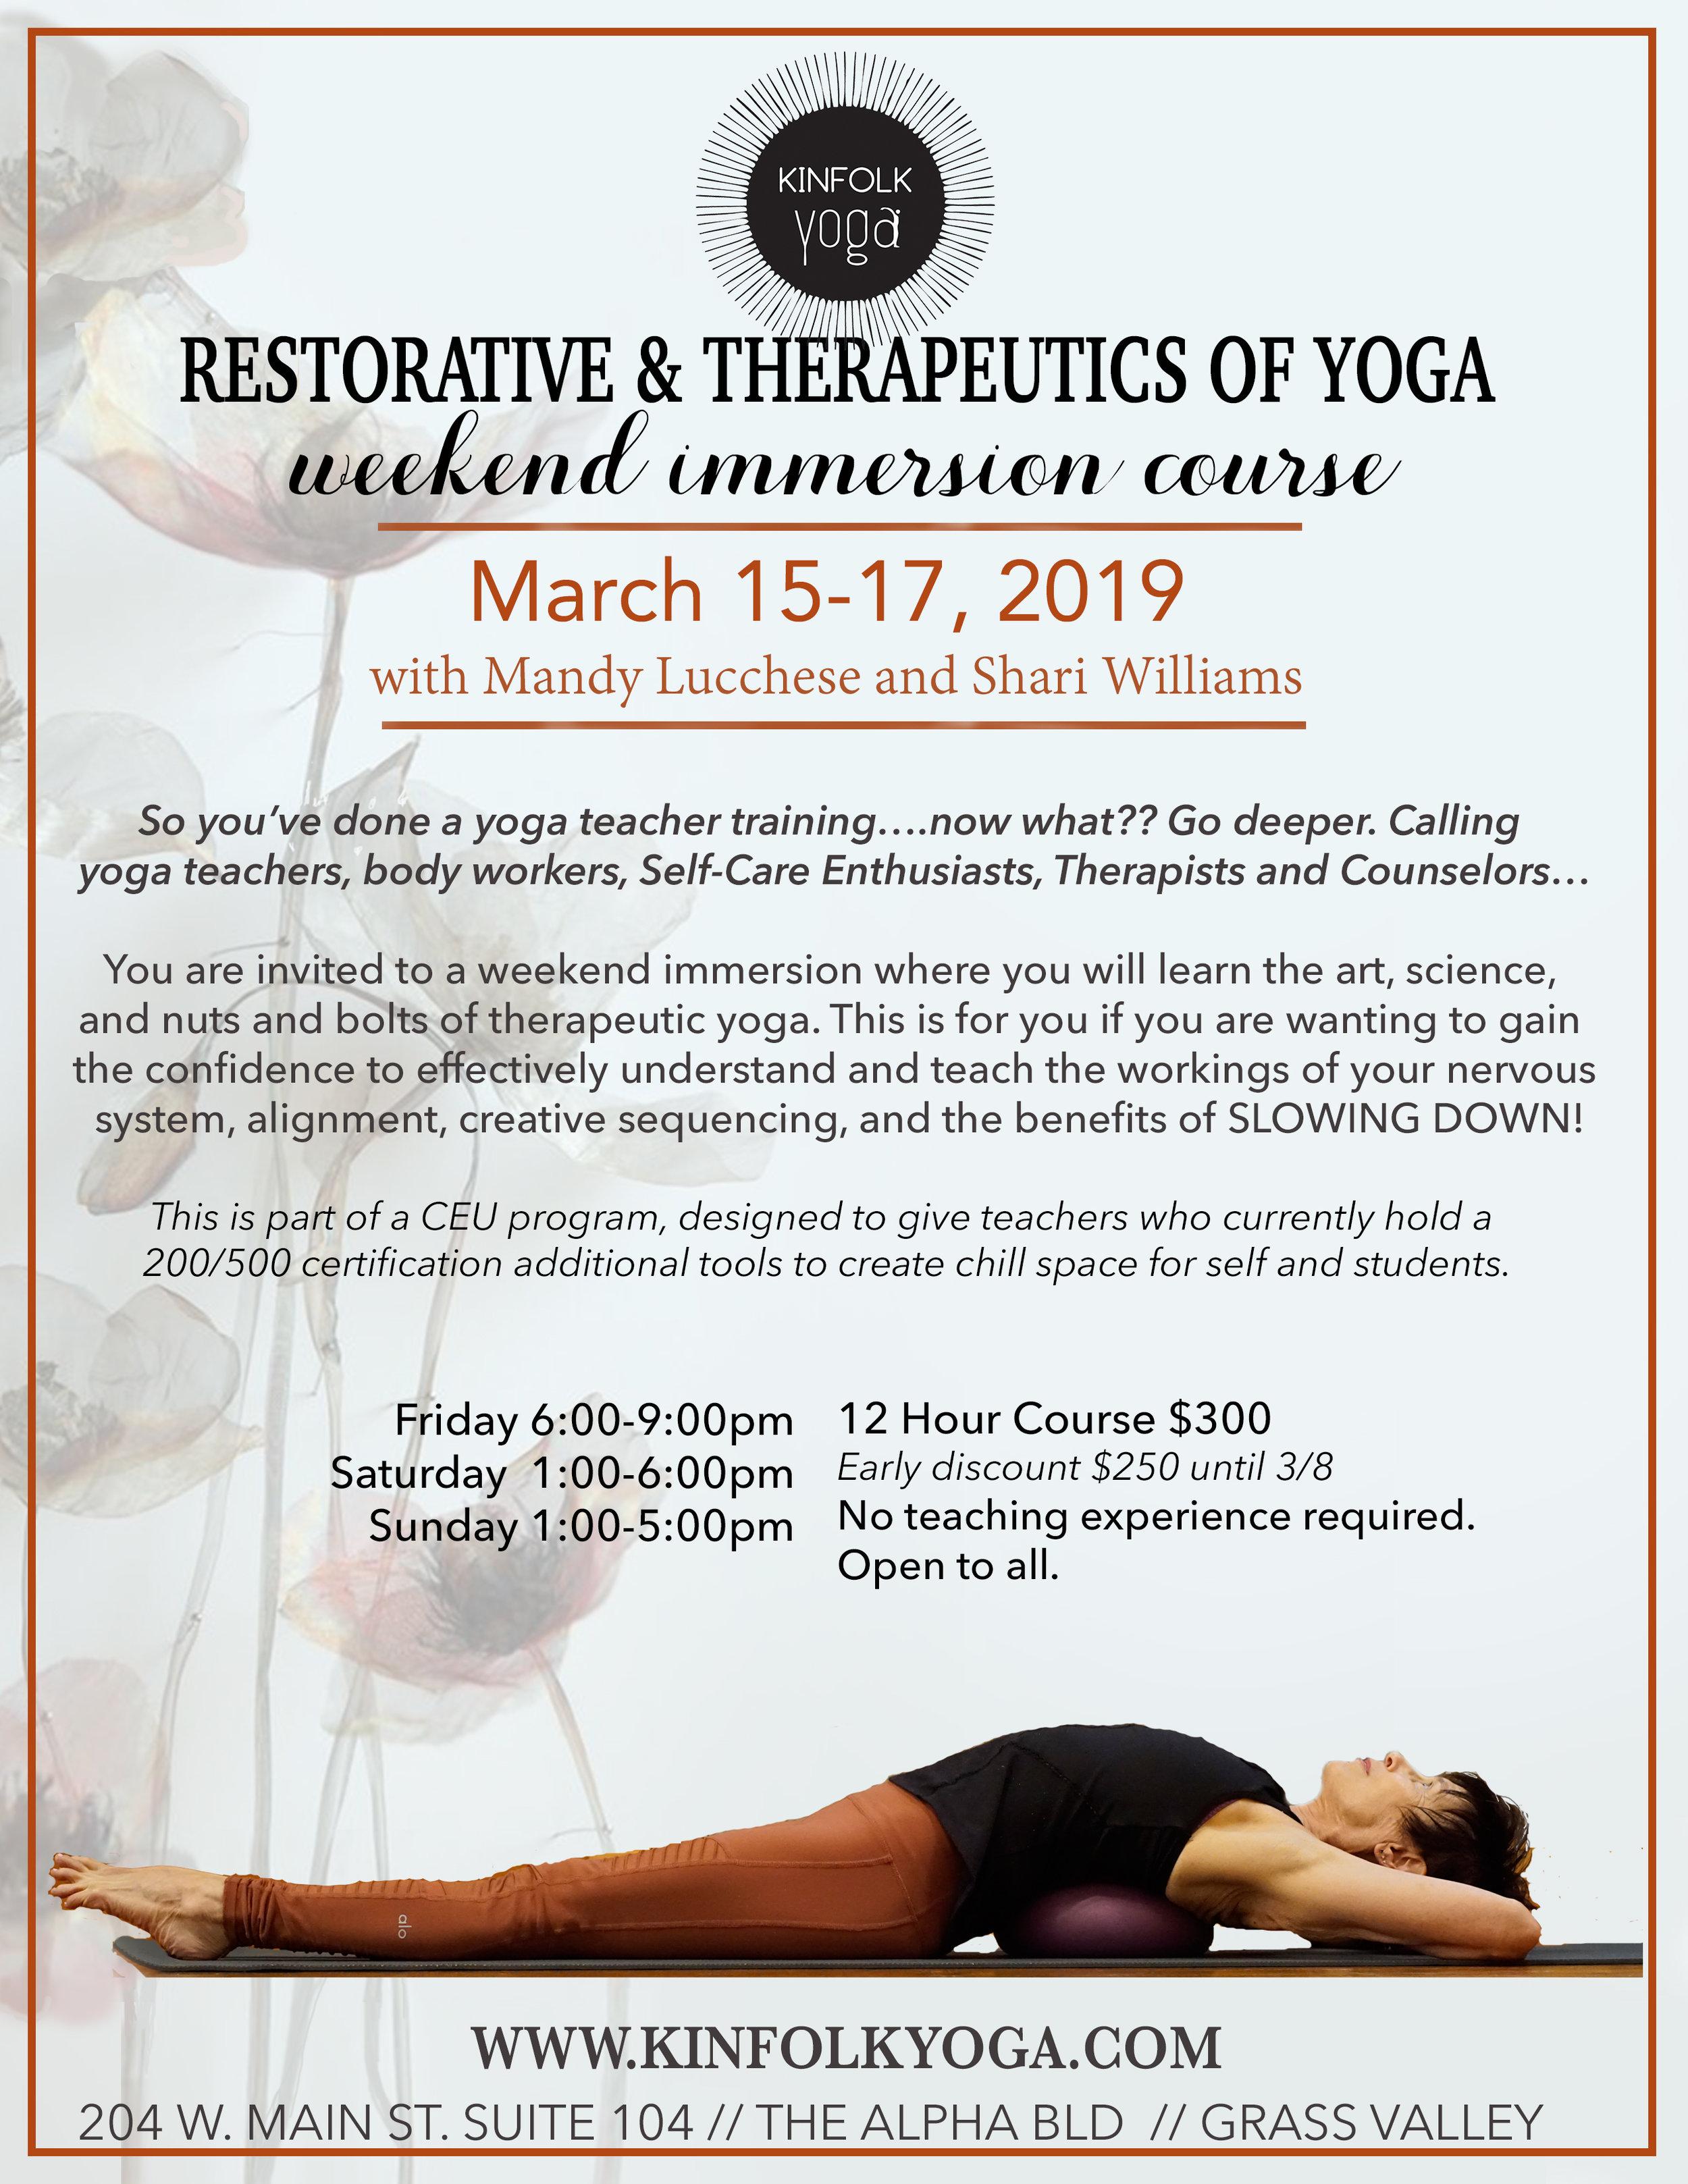 Kinfolk Yoga Offerings